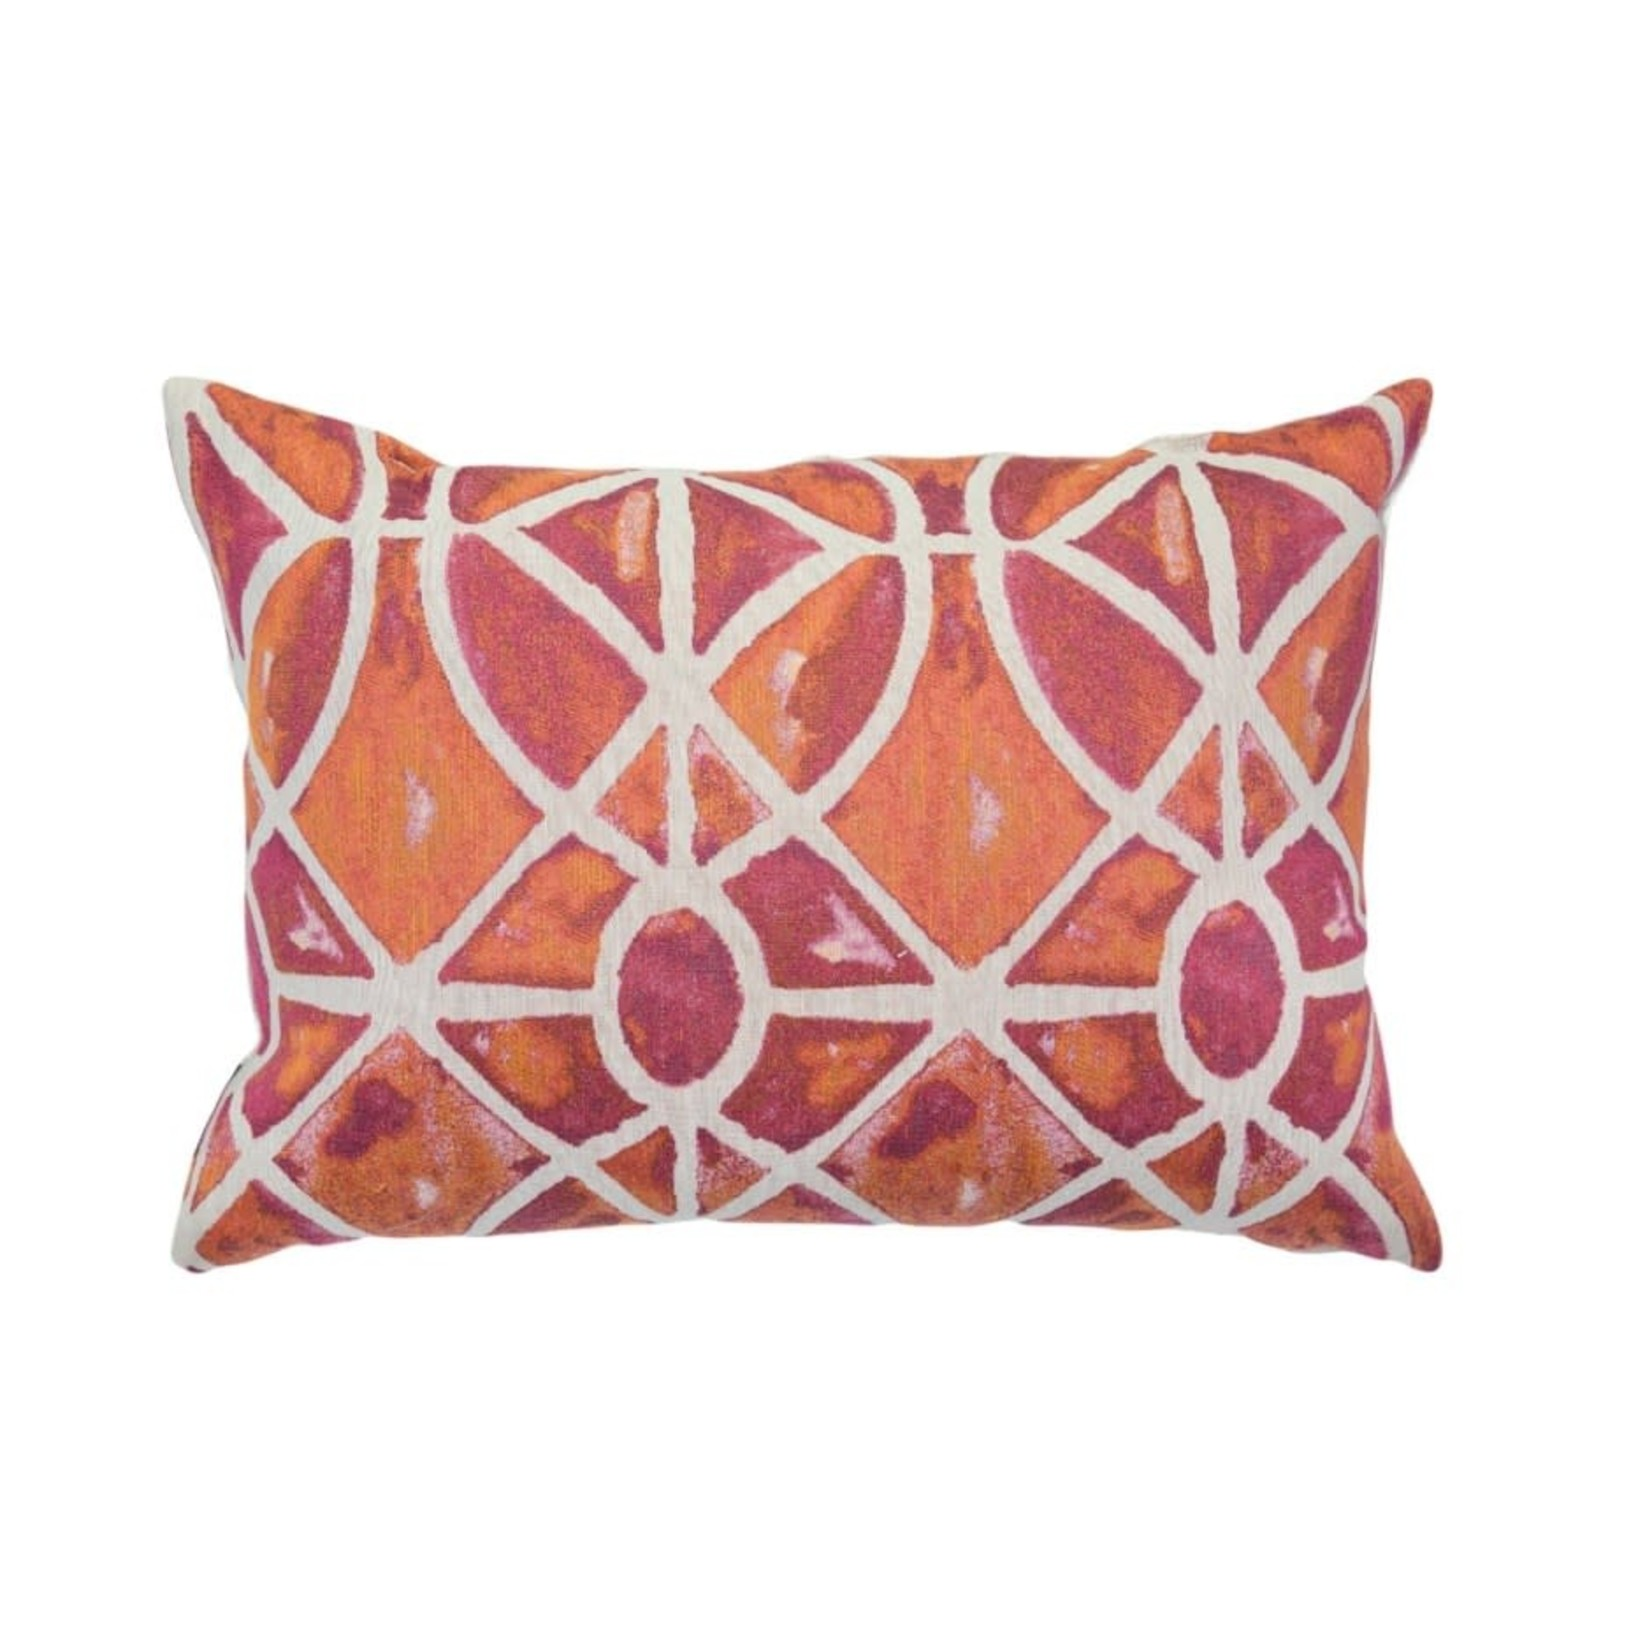 Valdese Kirshy-Poppy Pillow